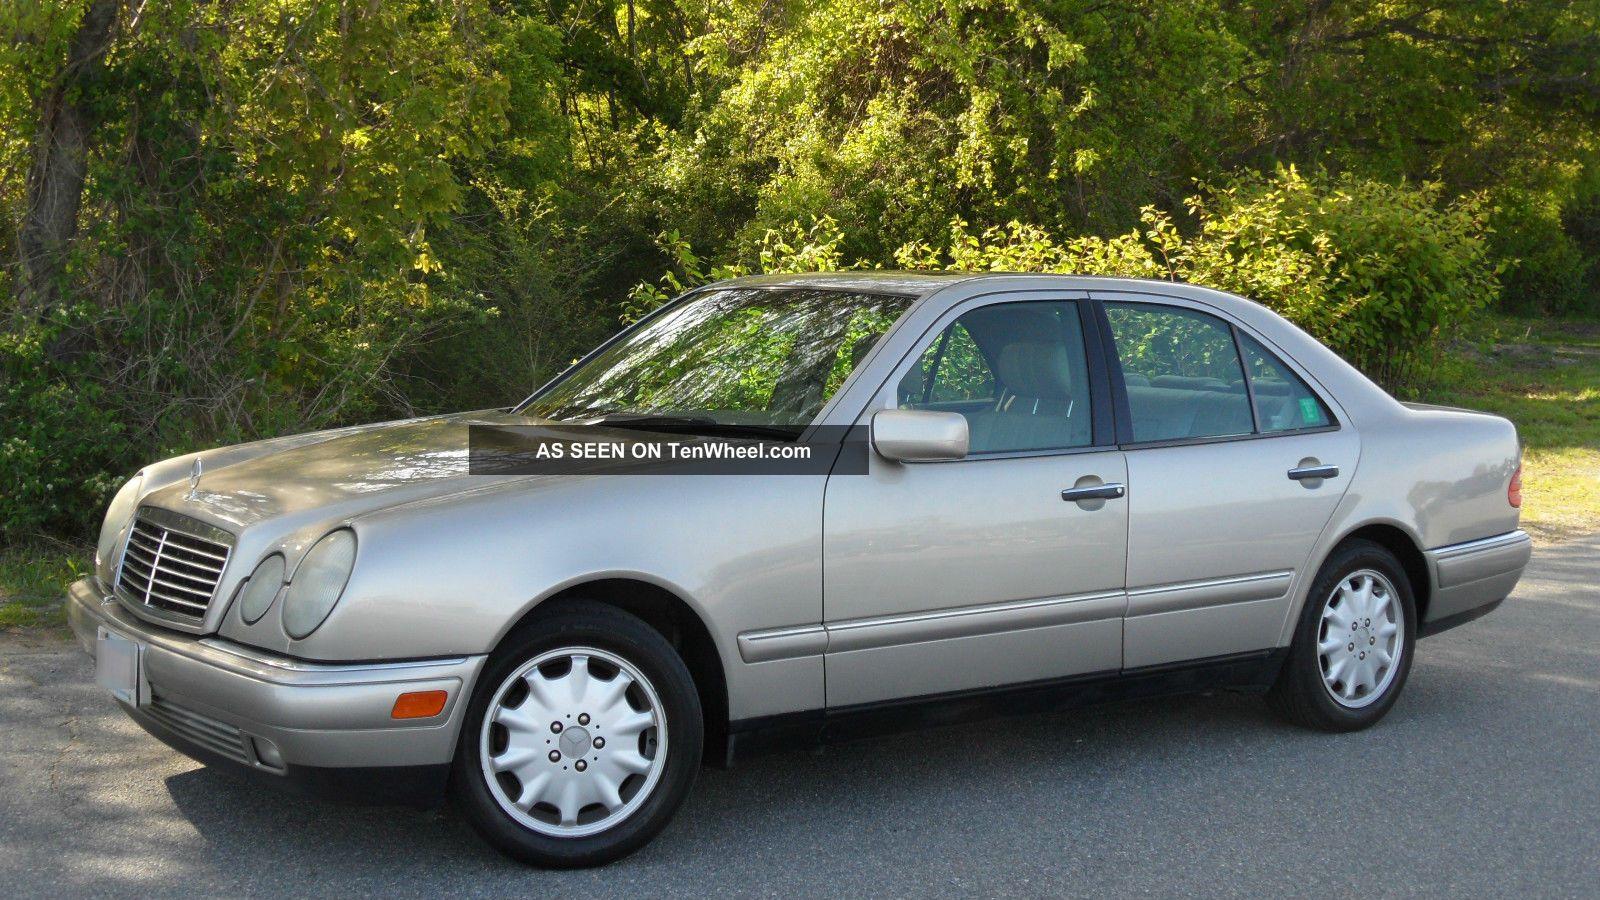 1998 mercedes benz e300 turbodiesel 4 door 3 0l 35 for Mercedes benz 1998